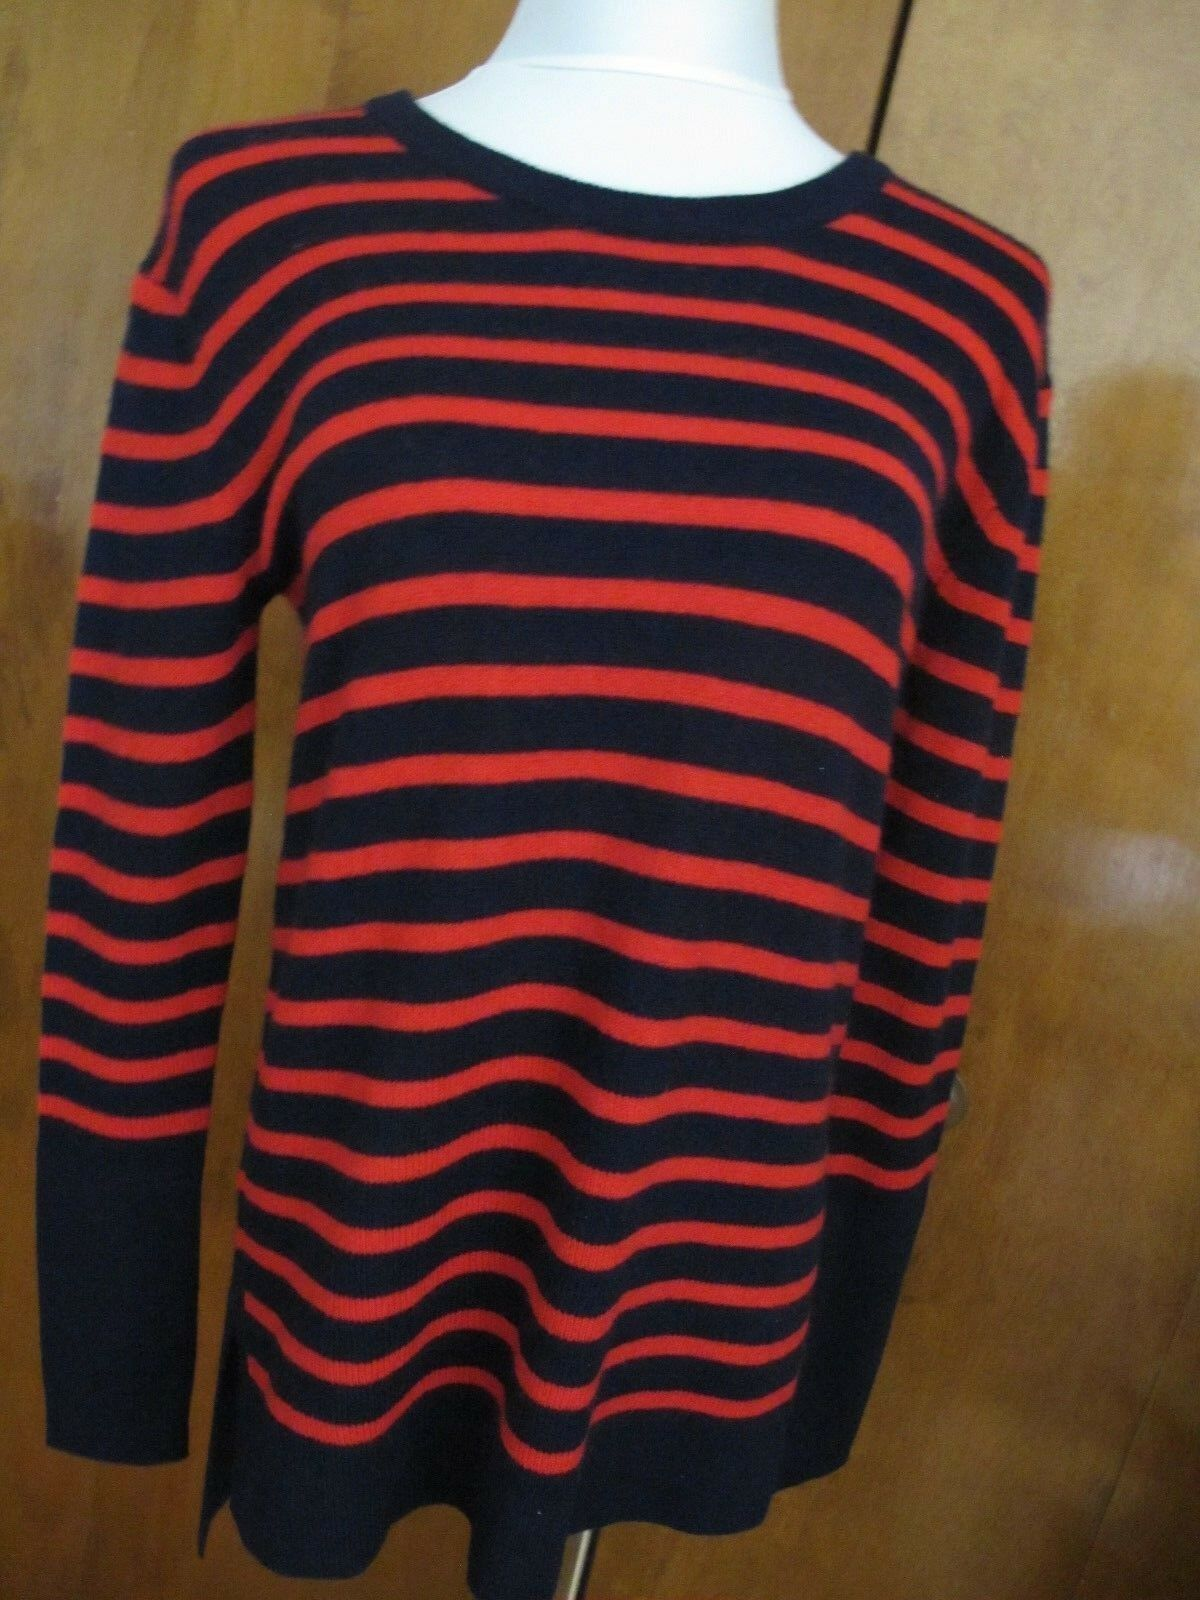 Aqua Women's Peacoat Red Cashmere Asymmetrical Sweater Sweater Sweater Sz Small NWT 631620